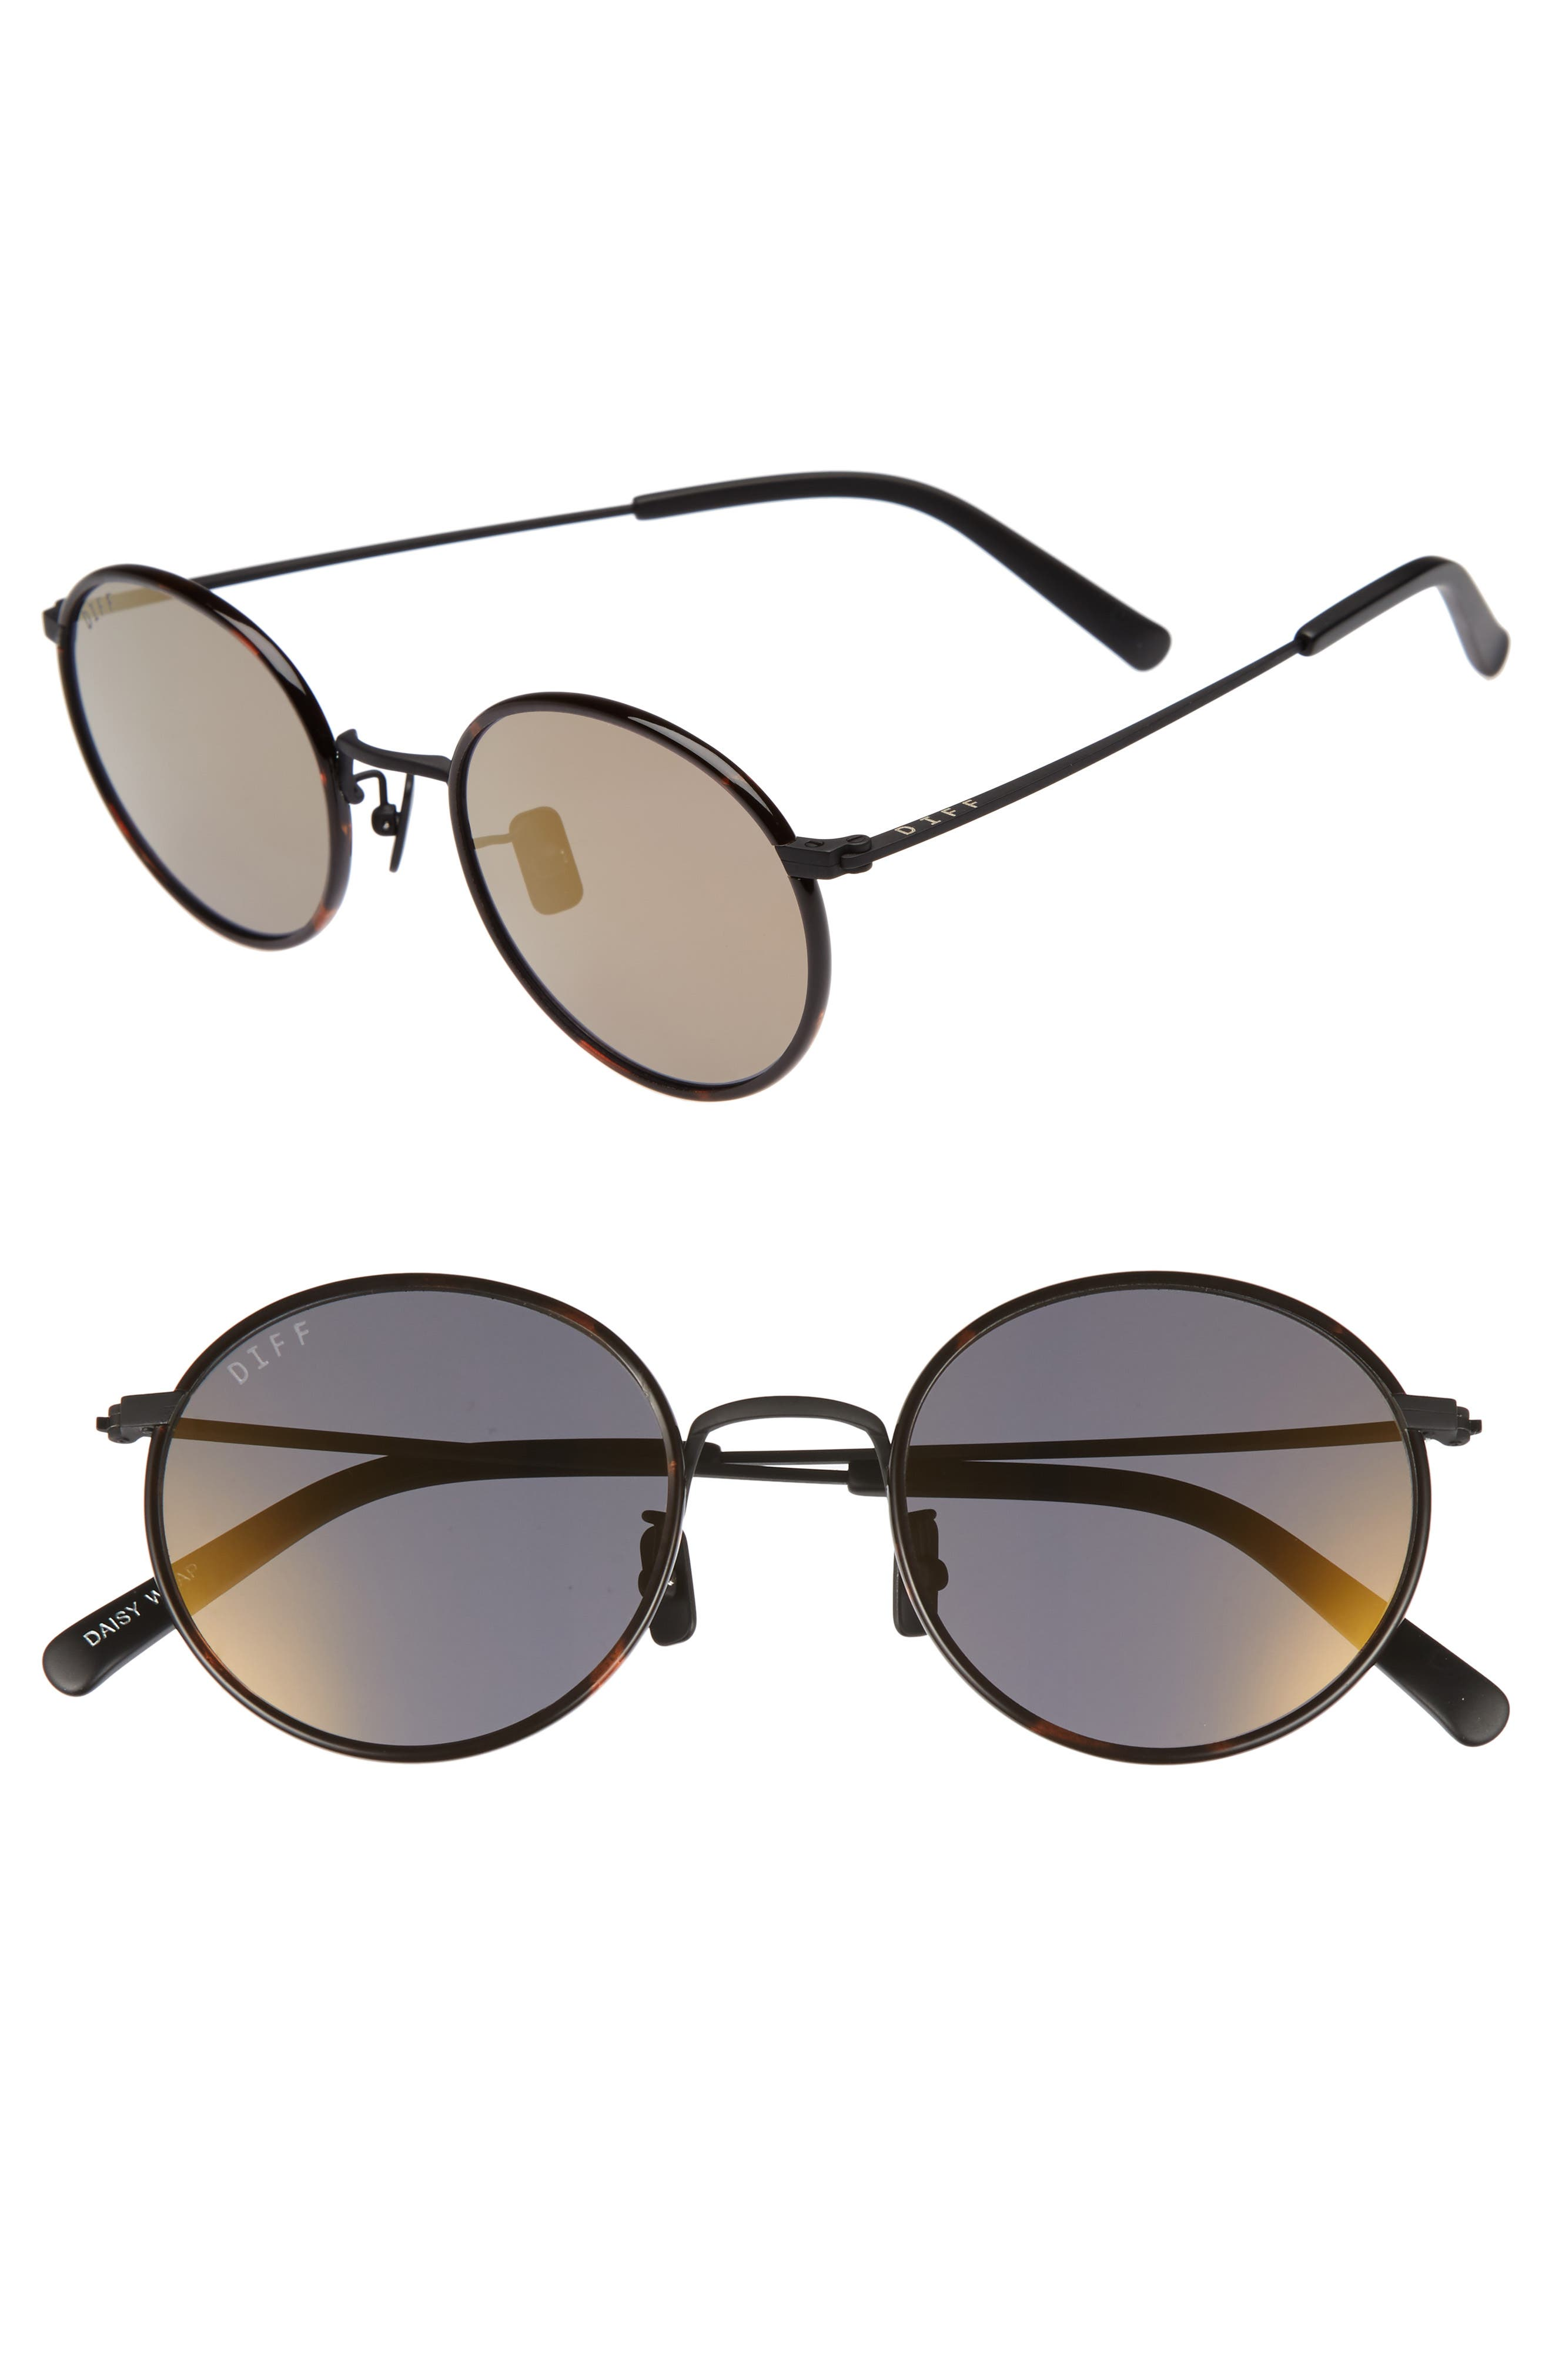 Daisy 57mm Polarized Round Lens Sunglasses,                             Main thumbnail 1, color,                             Matte Black/ Grey Blue